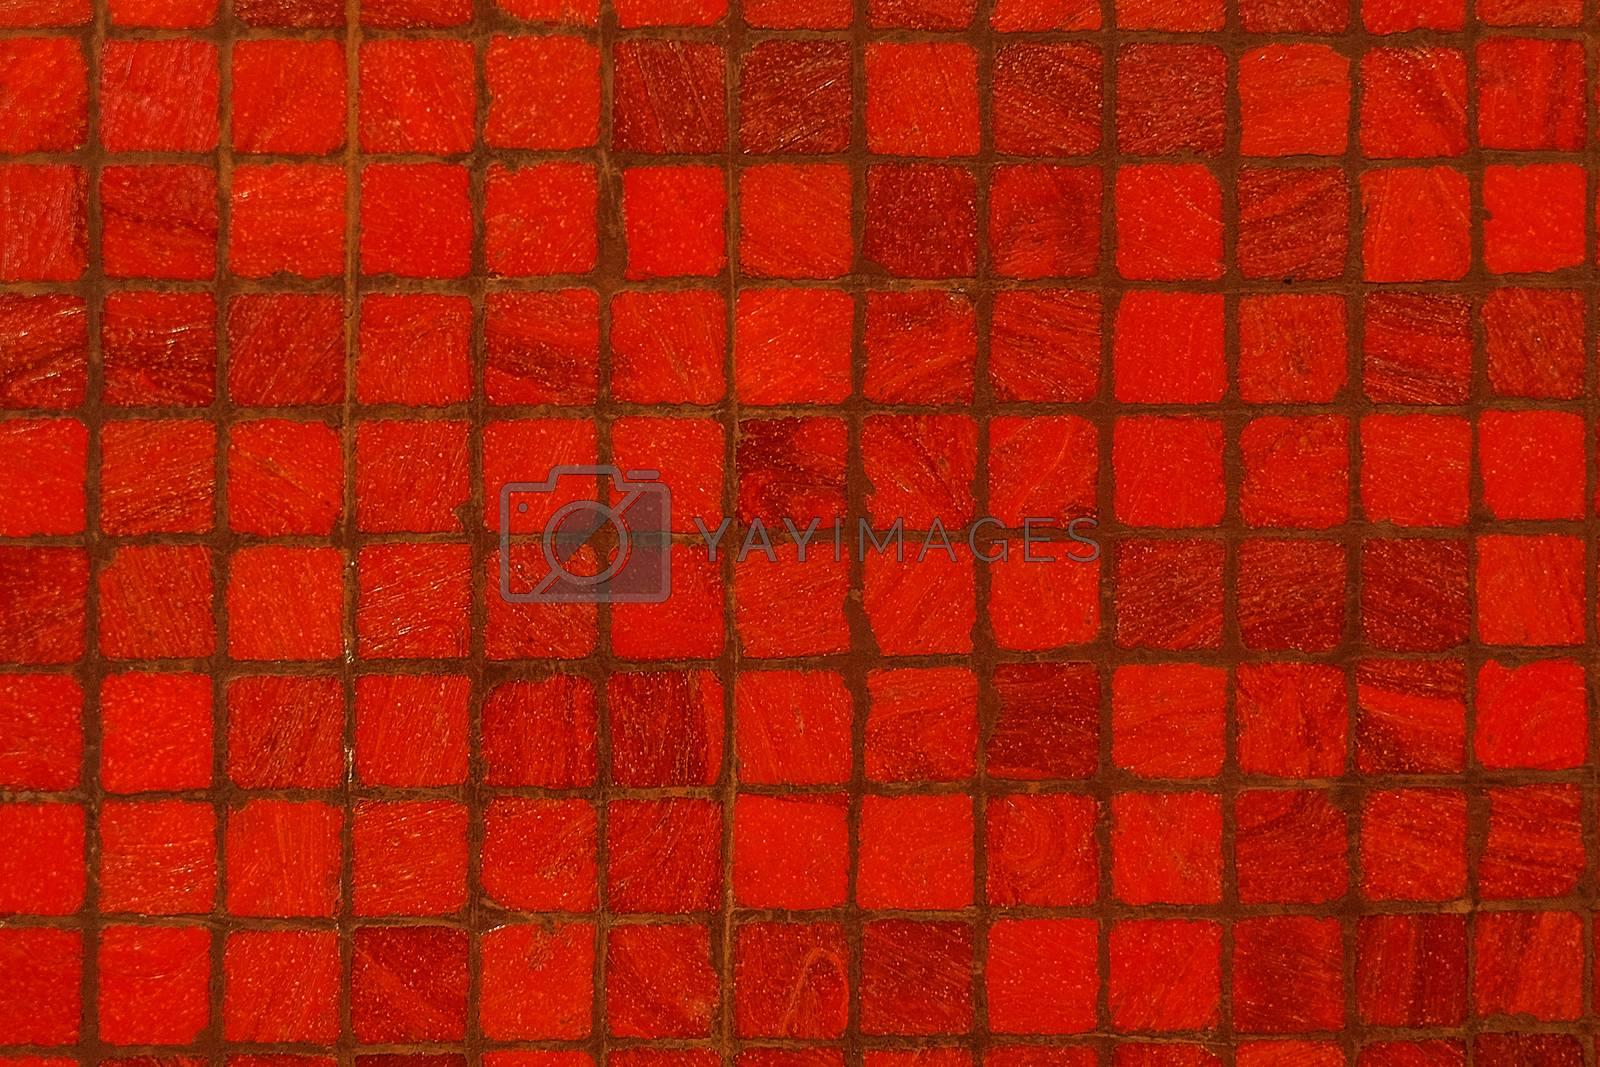 Red tile pattern